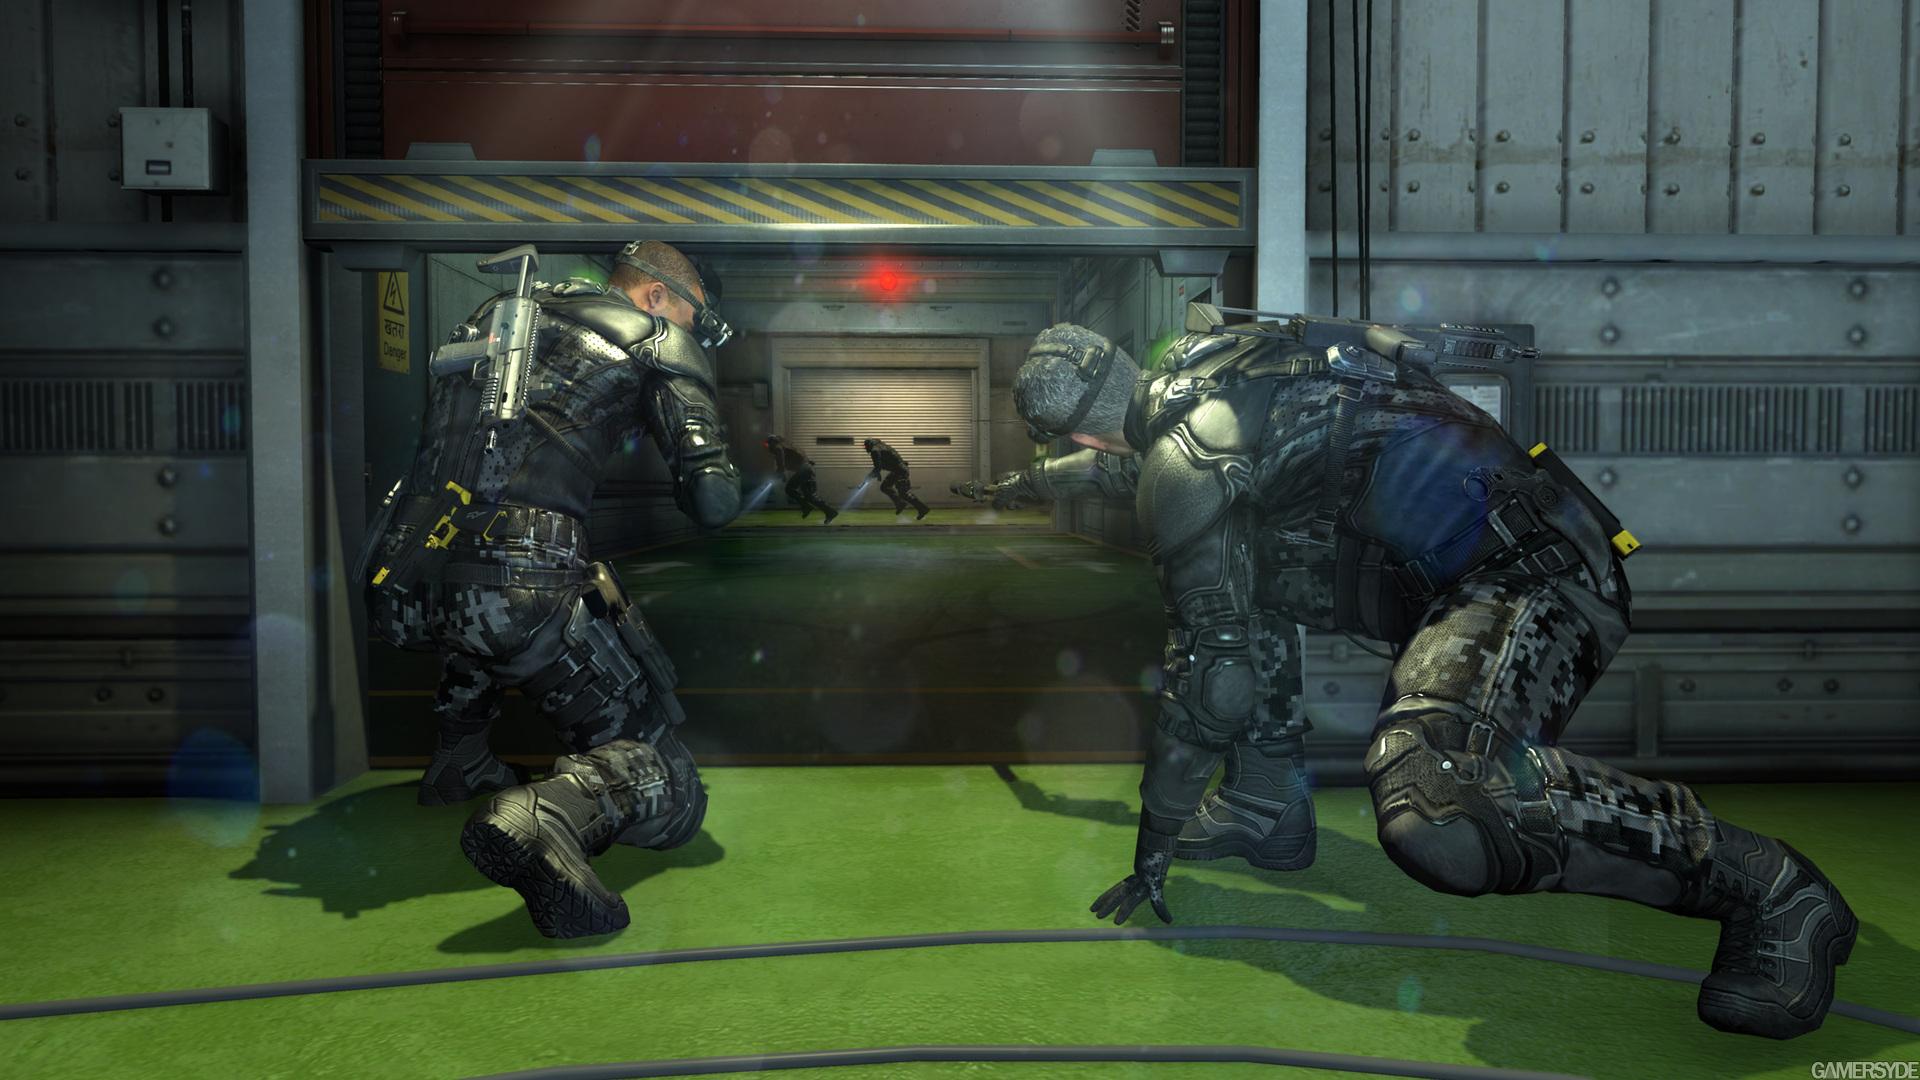 image tom clancy s splinter cell blacklist 22411 2521 0002 با تصاویر جدید Splinter Cell: Blacklist همراه باشید